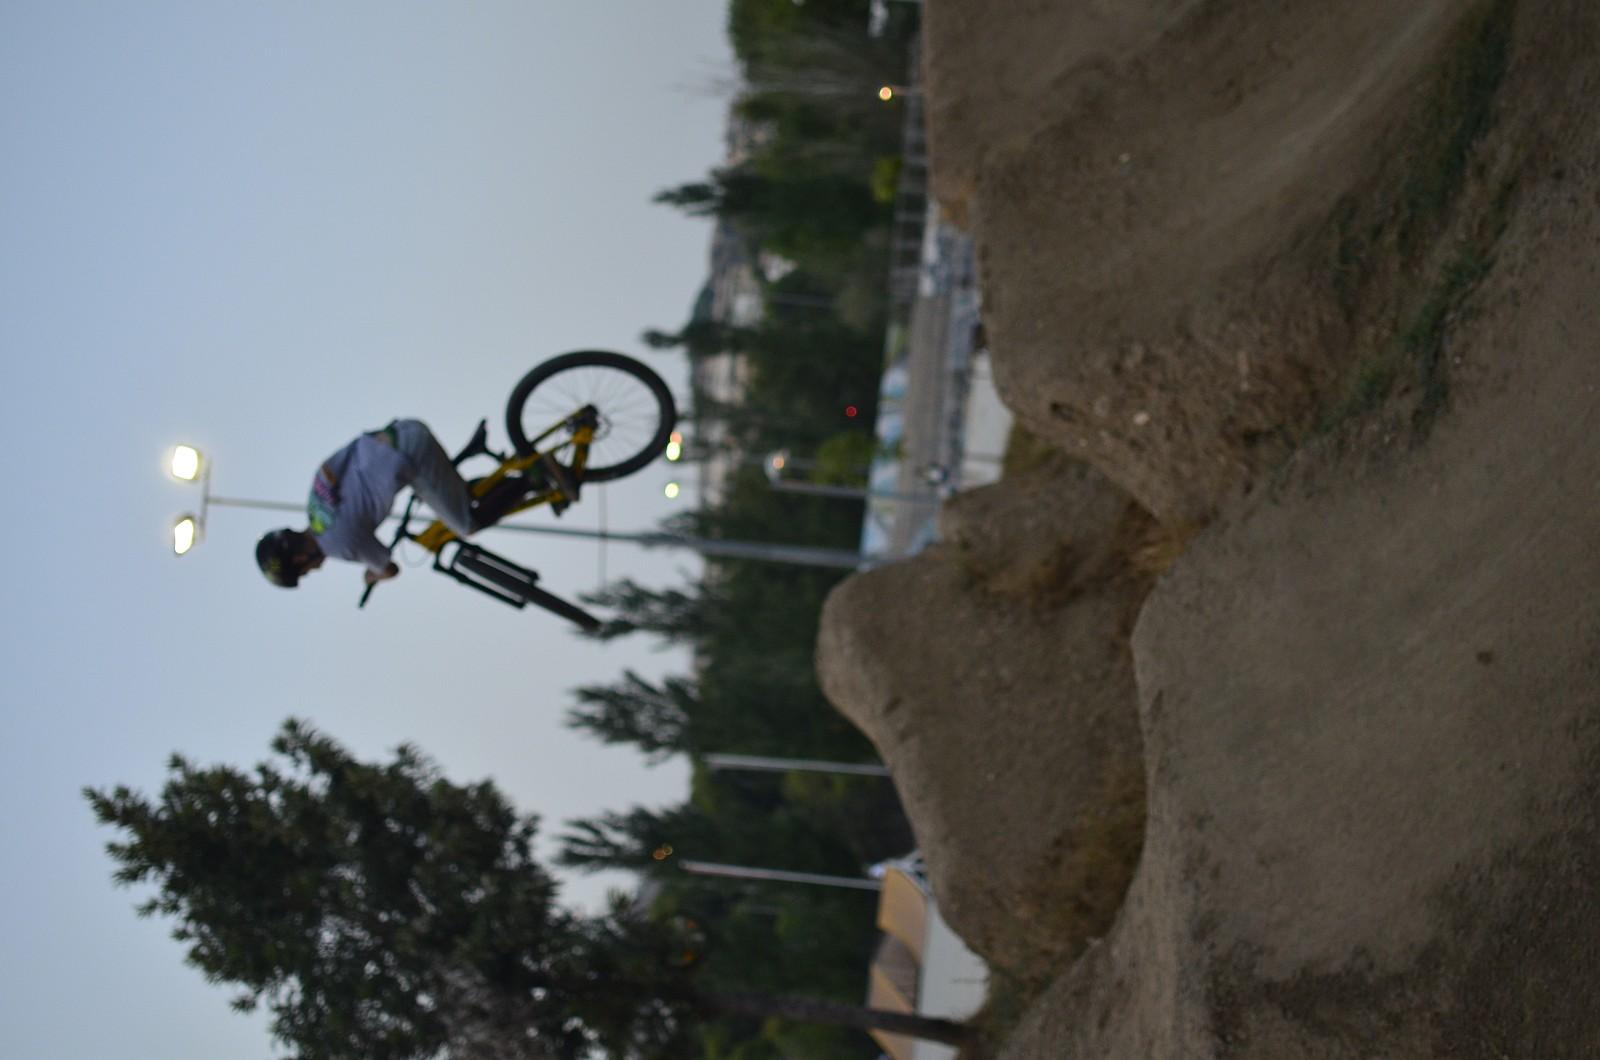 DSC0152 - iguelgonz - Mountain Biking Pictures - Vital MTB